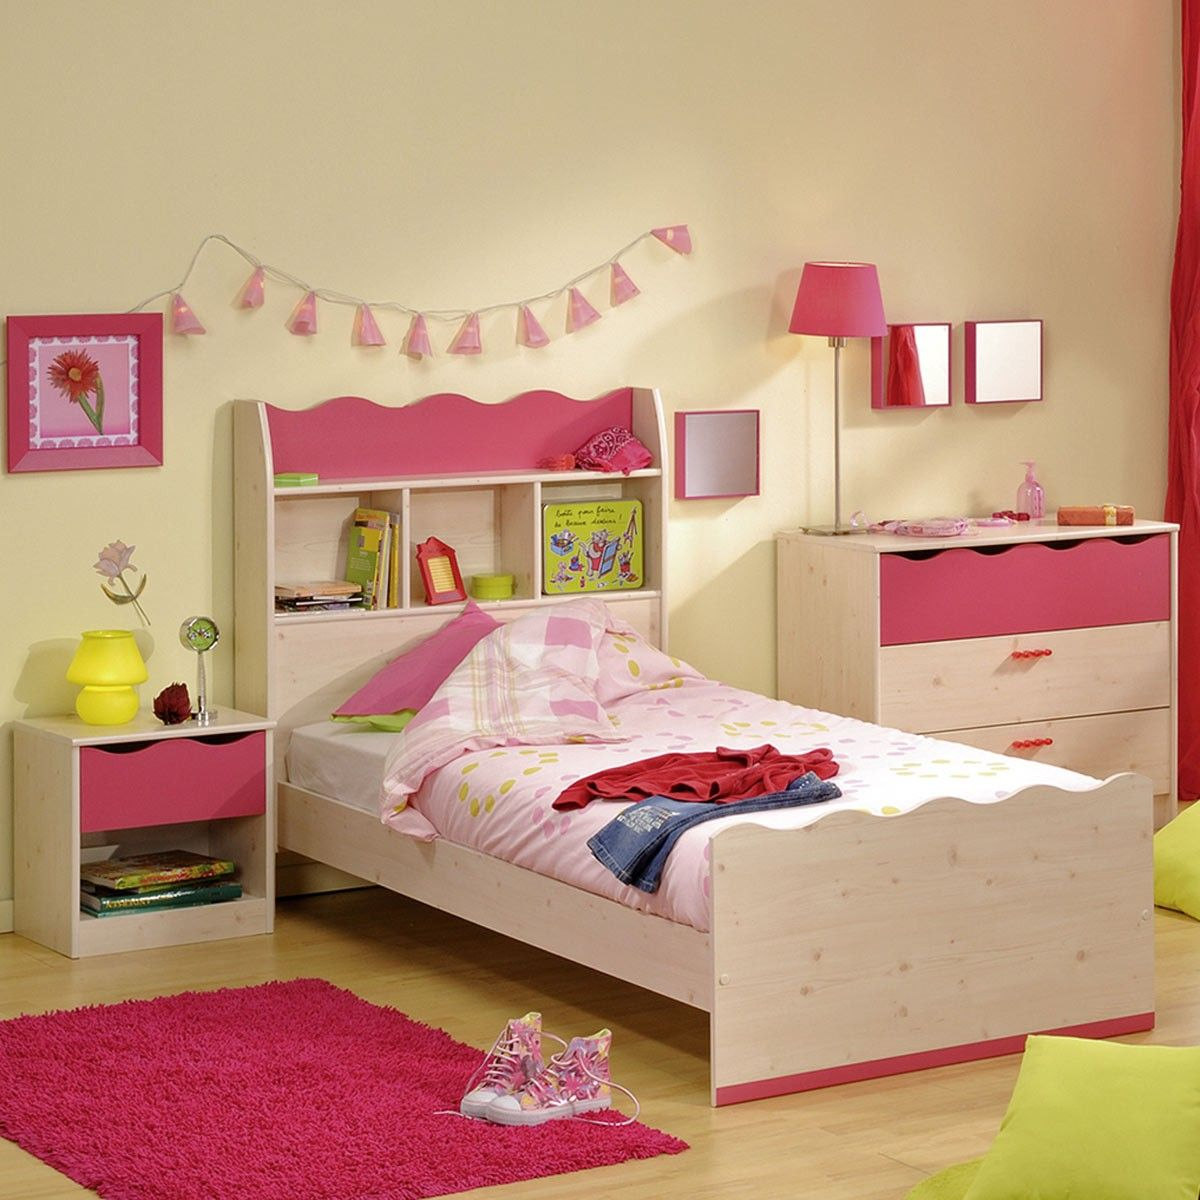 Full Size of Mädchenbetten Bett Mit Regal Kinderbett Mdchenbett 90200 In Wohnzimmer Mädchenbetten